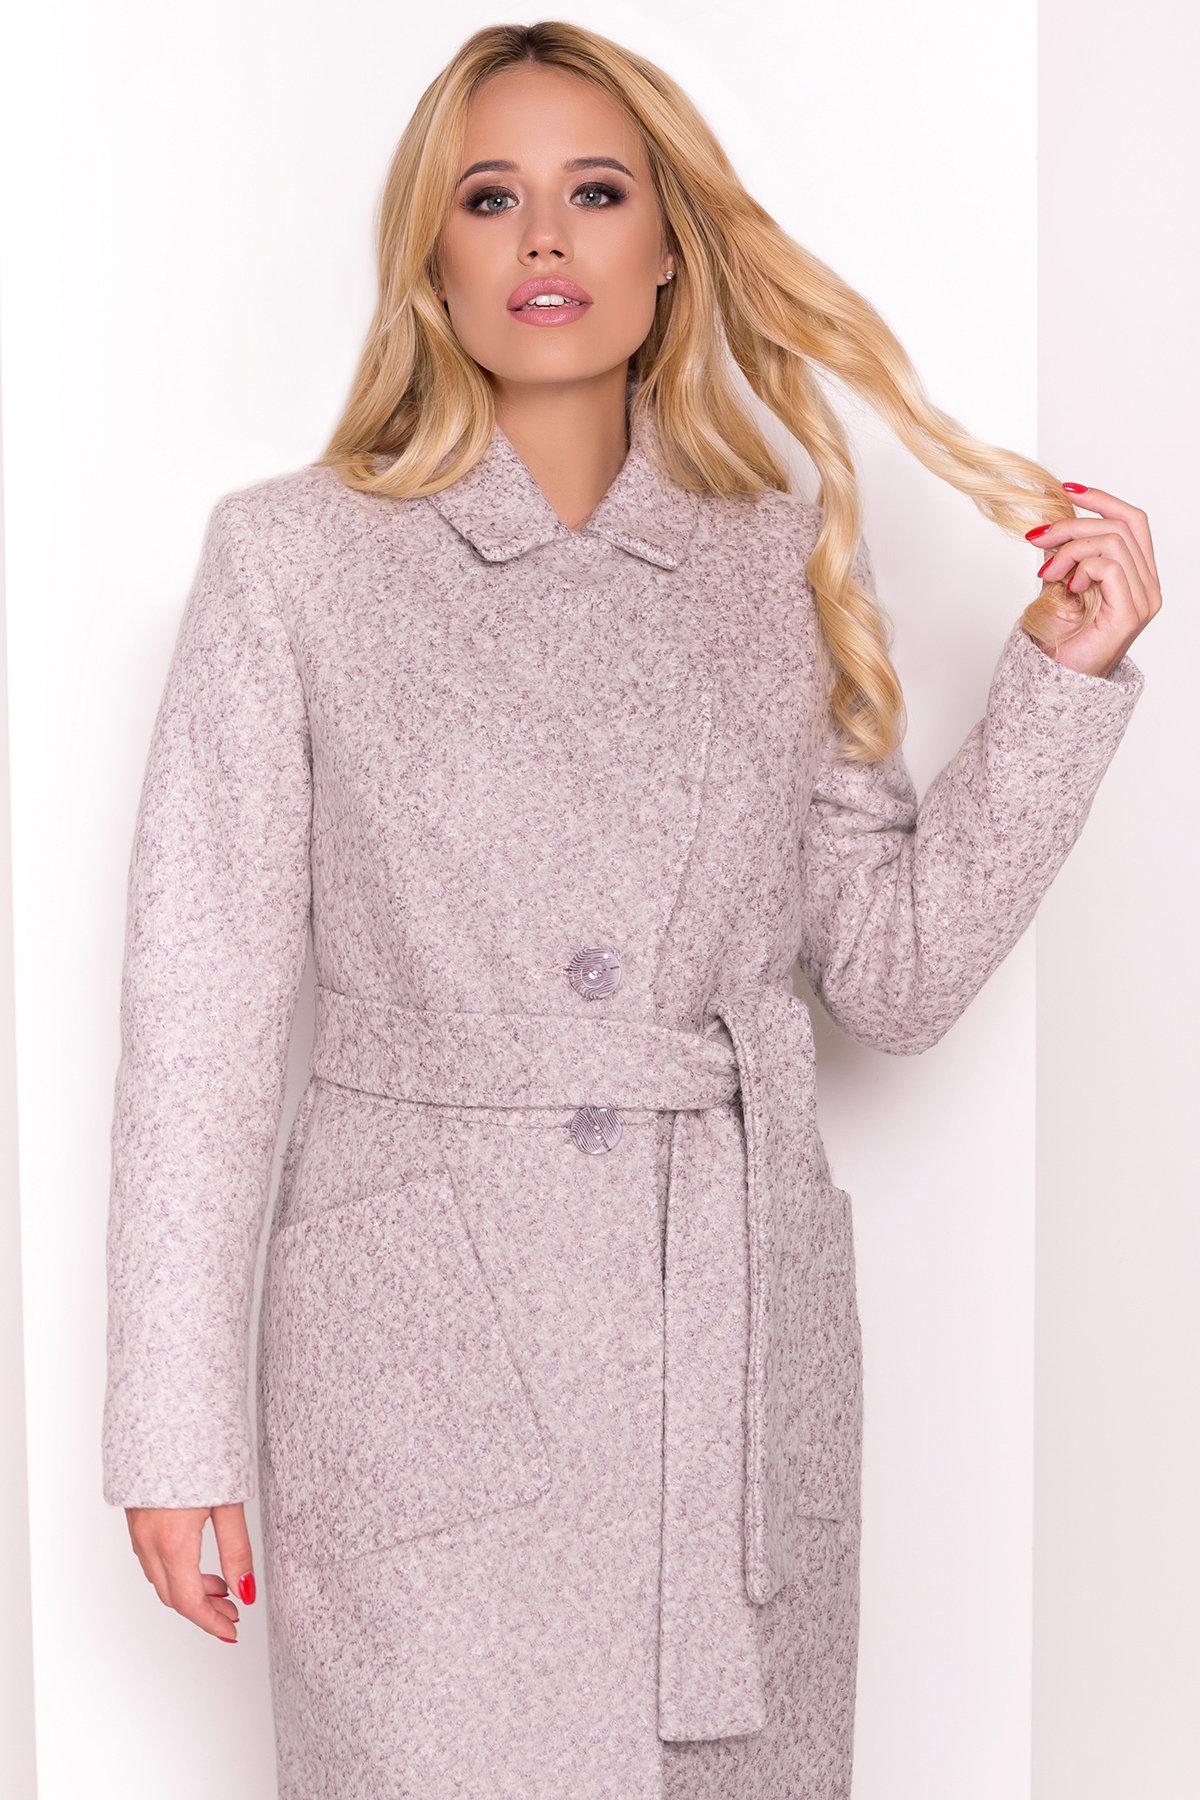 Пальто Габриэлла 4153 АРТ. 20309 Цвет: Серый/бежевый - фото 3, интернет магазин tm-modus.ru